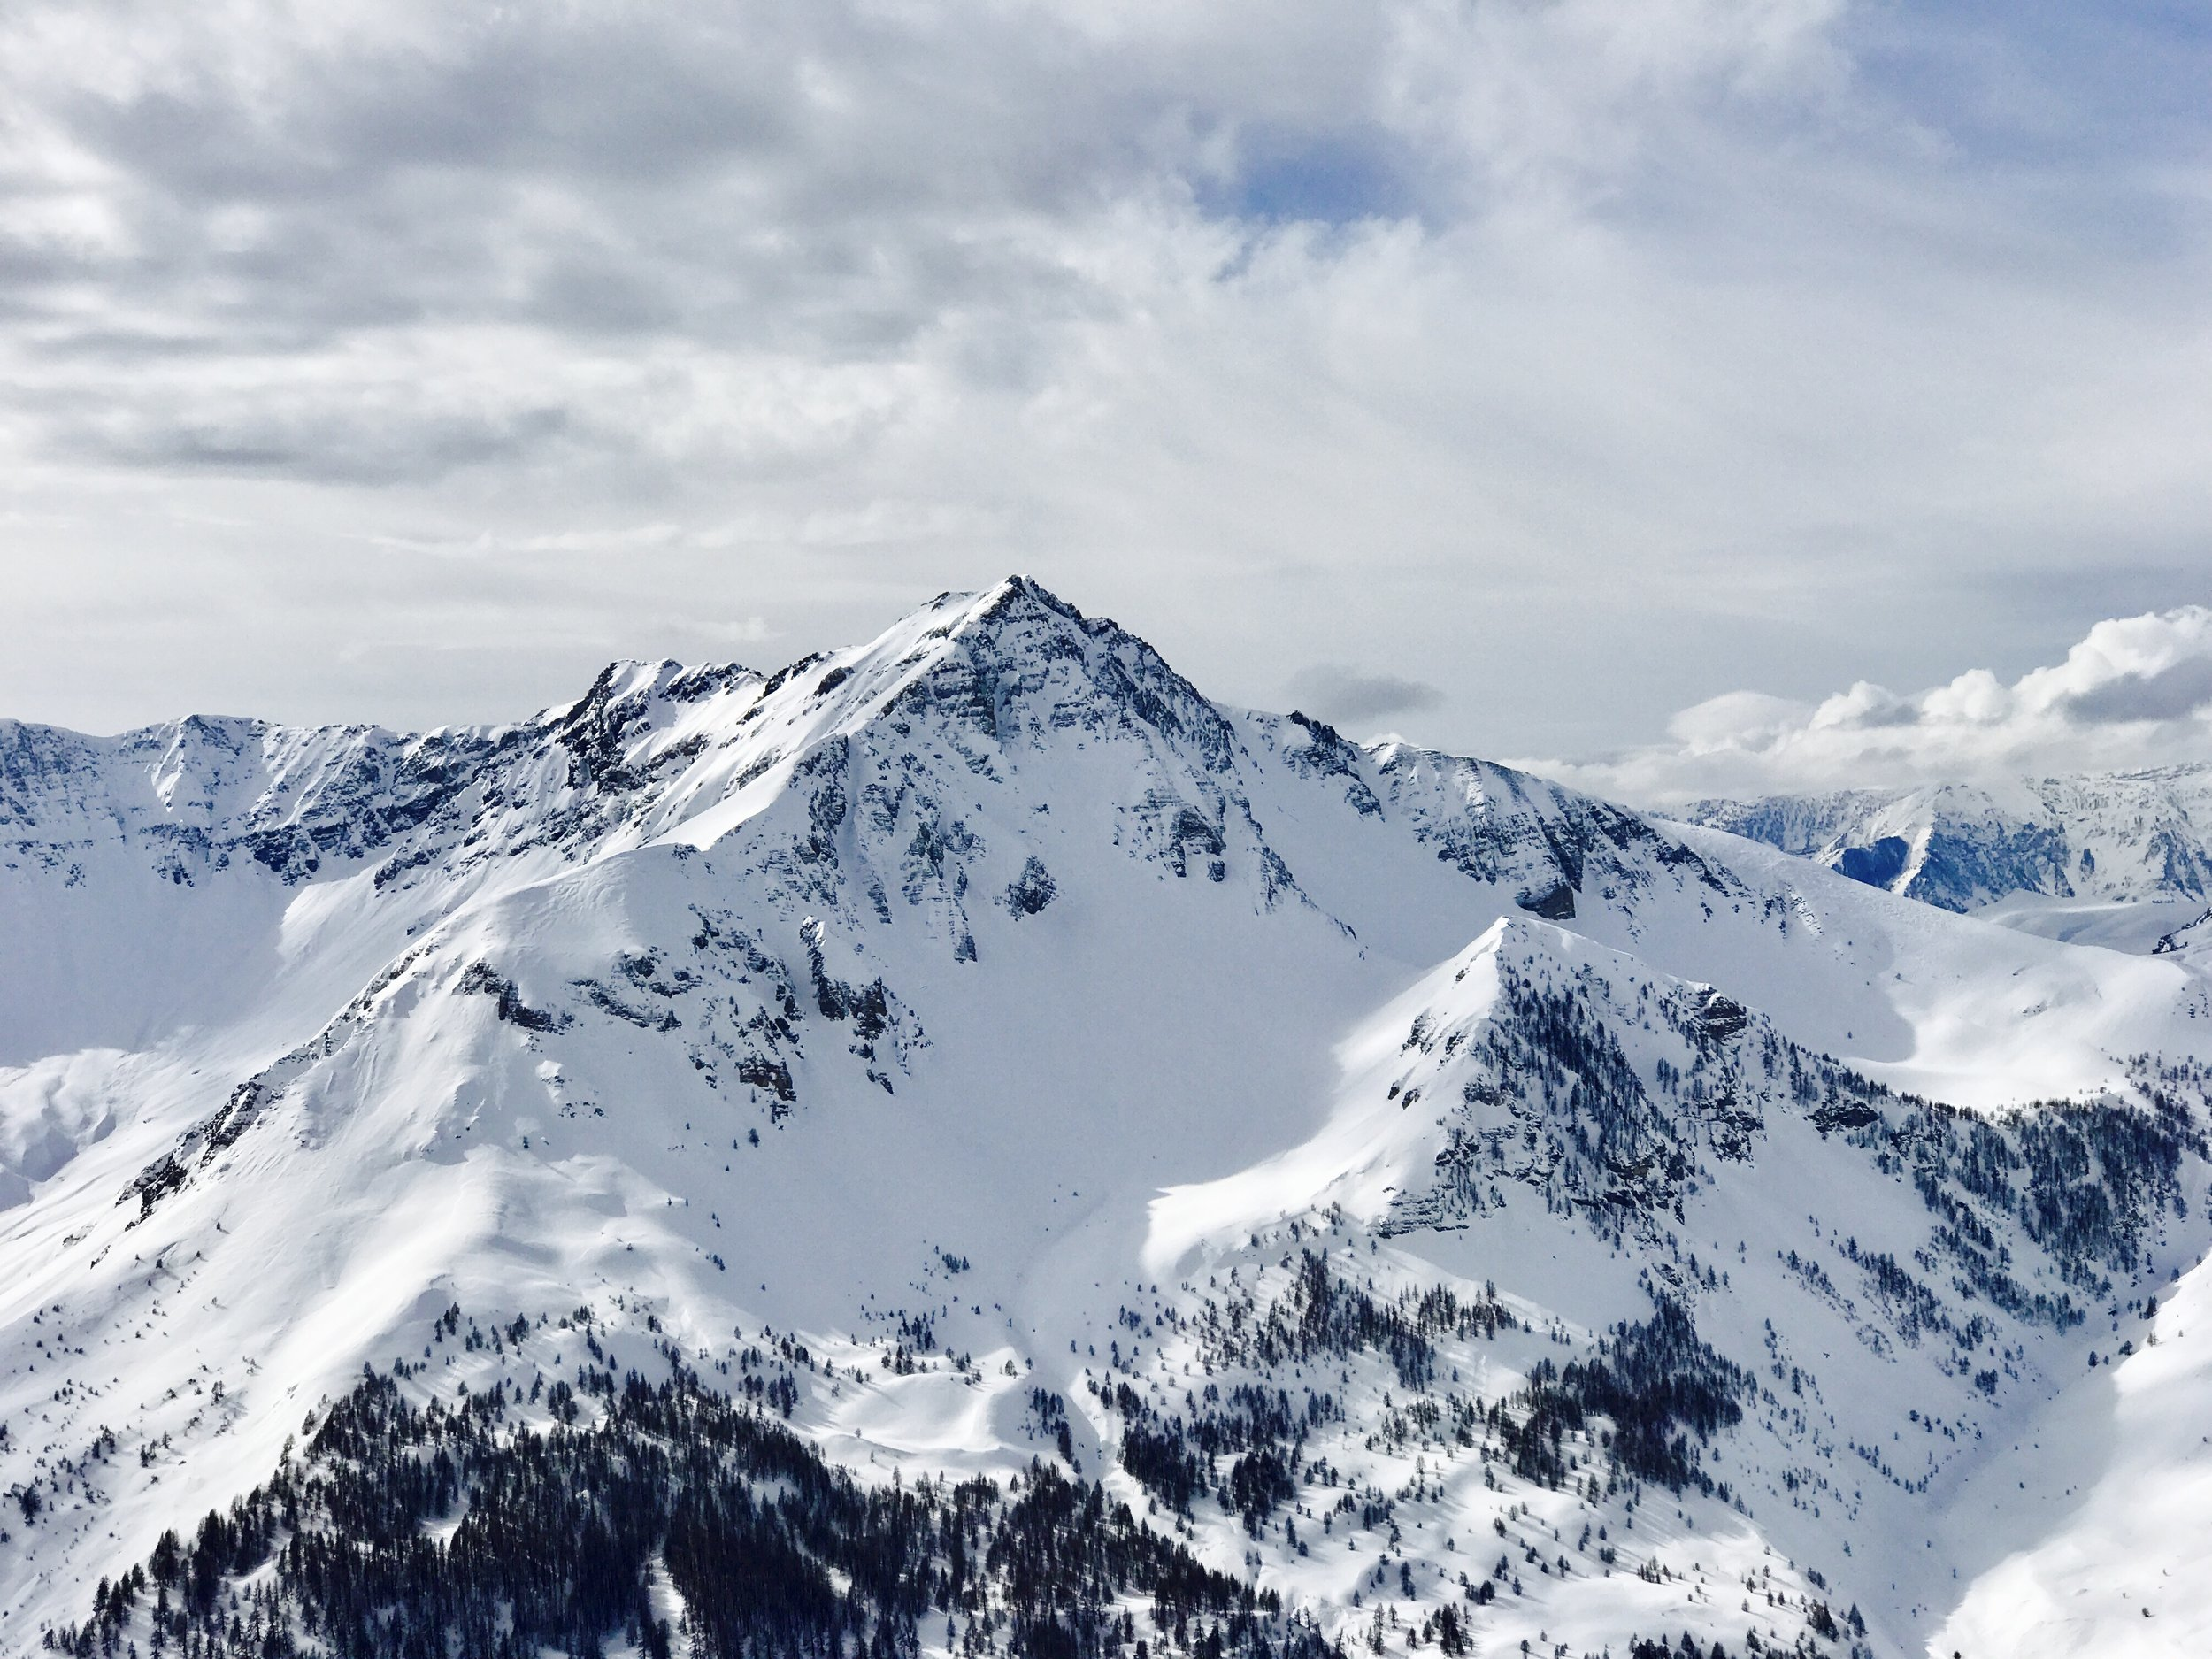 Snow Locations Travel Guide | The Man's Handbook Travel Blog